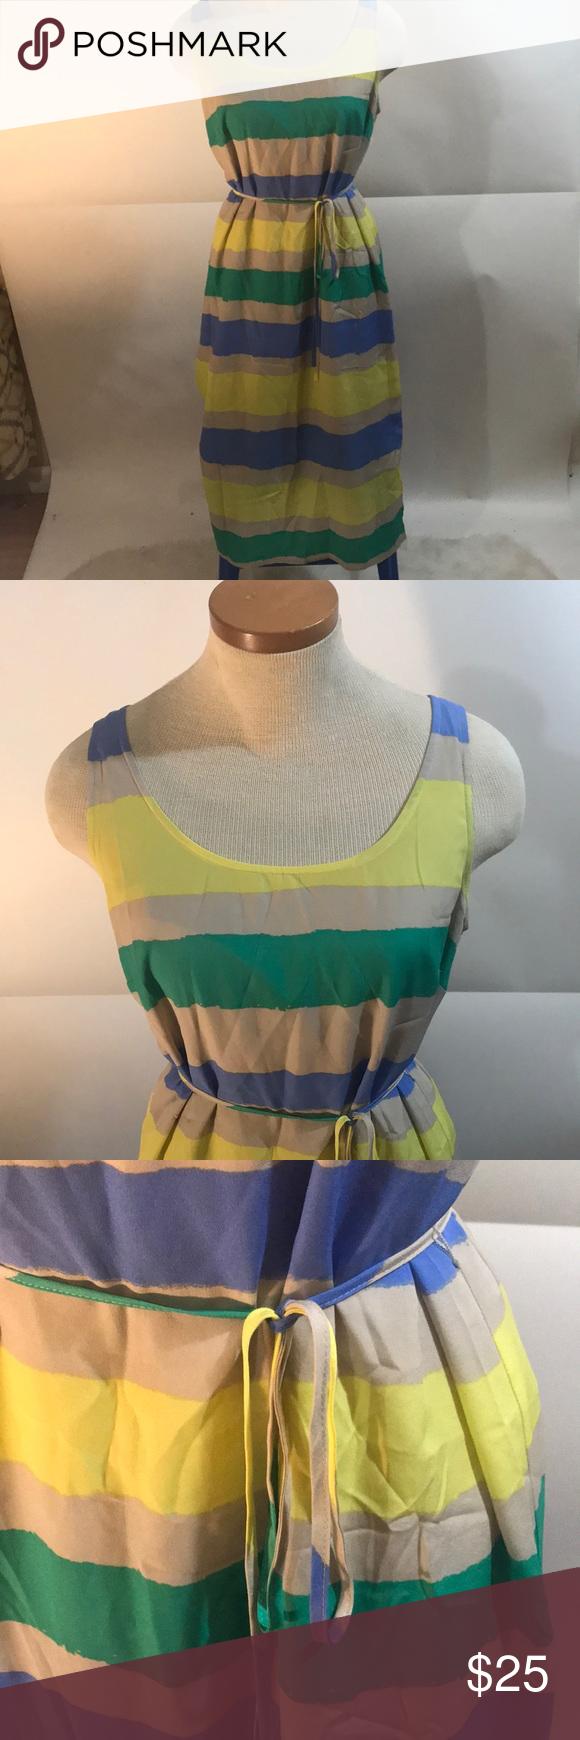 Striped Loft Dress Yellow Tan Blue And Green Striped Dress Dresses Maxi Loft Dress Striped Dress Clothes Design [ 1740 x 580 Pixel ]